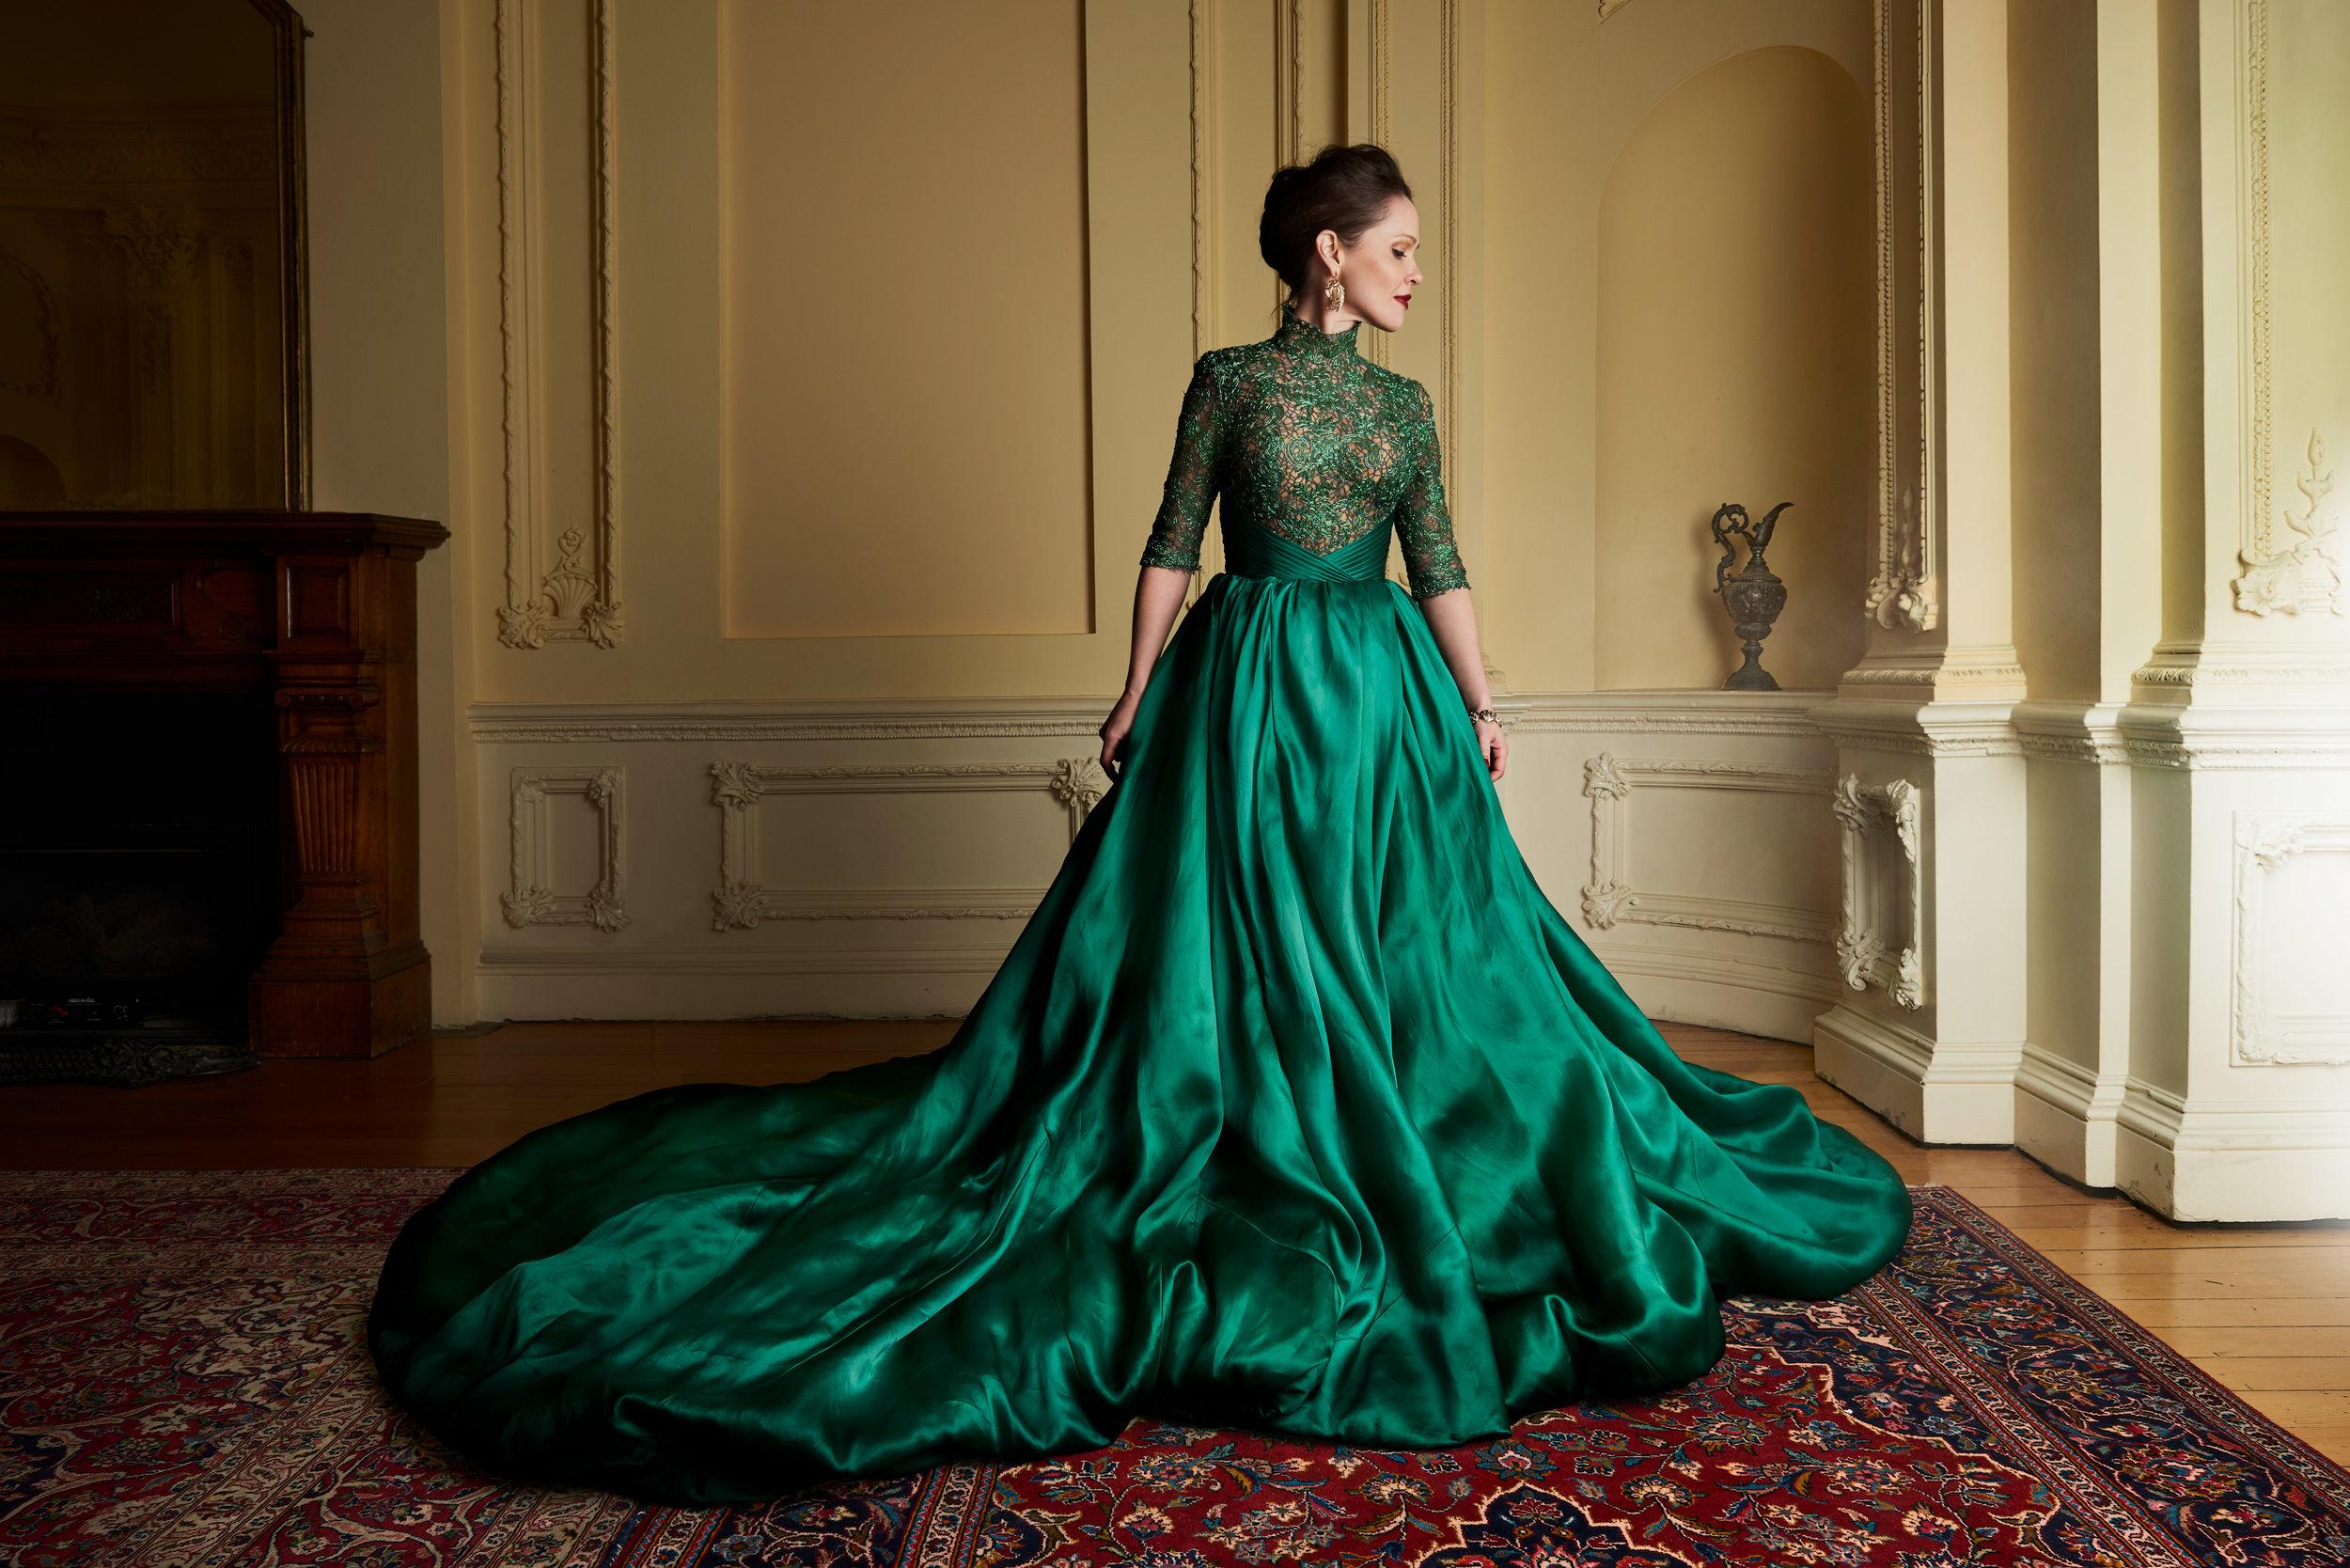 HR Green Dress 1-Credit Albert Comper.jpg